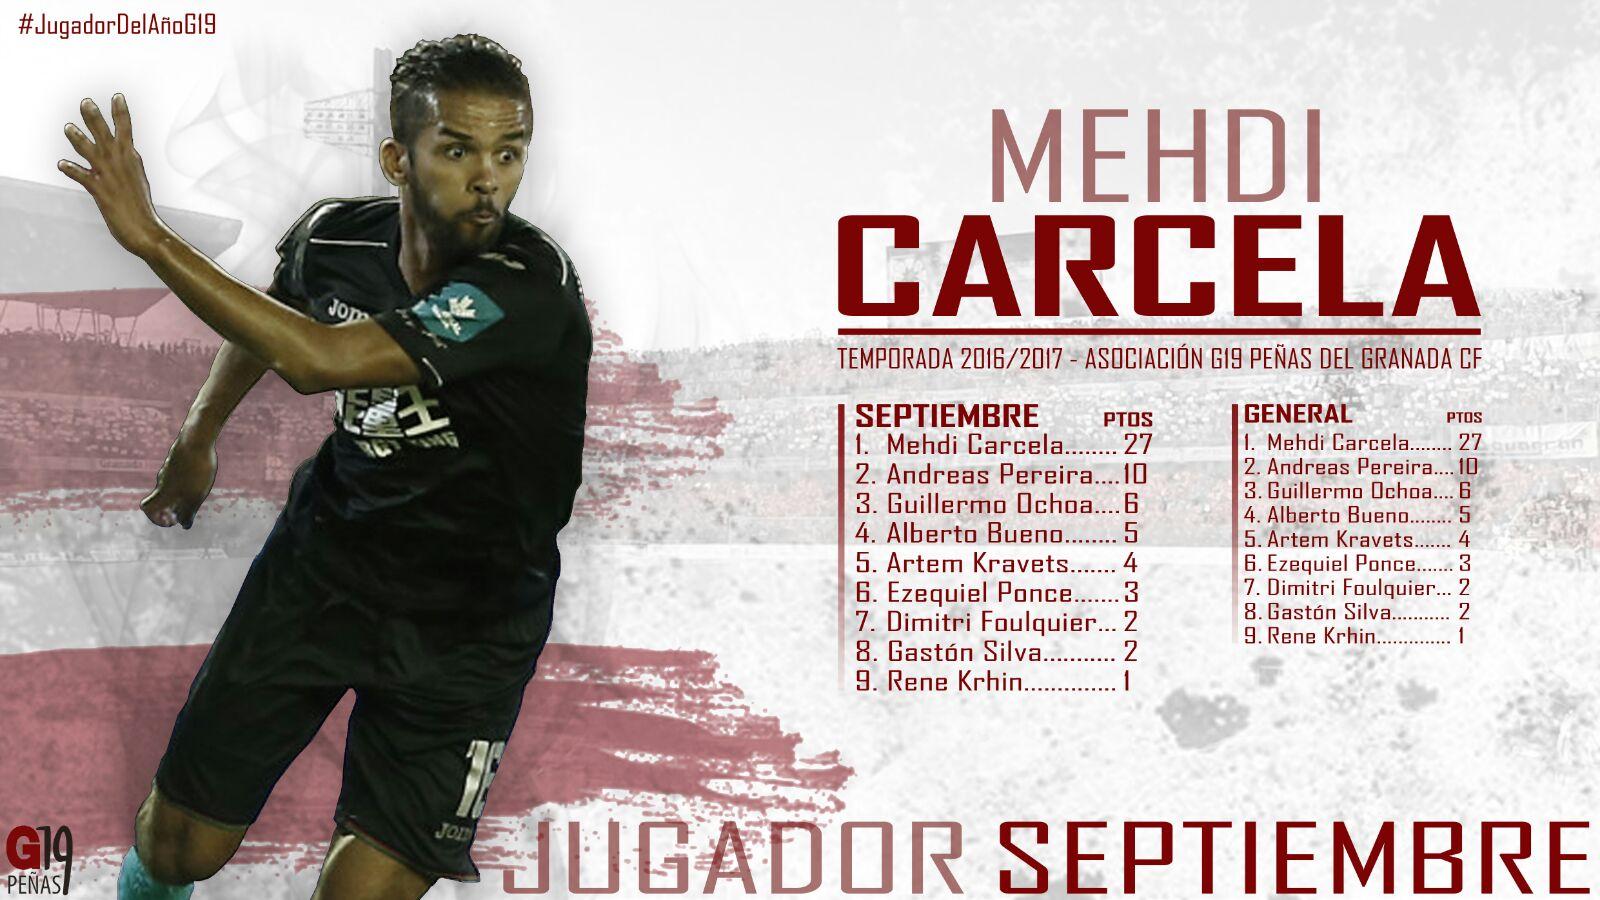 Premio Jugador G19 Septiembre: Mehdi Carcela. Imagen: G19